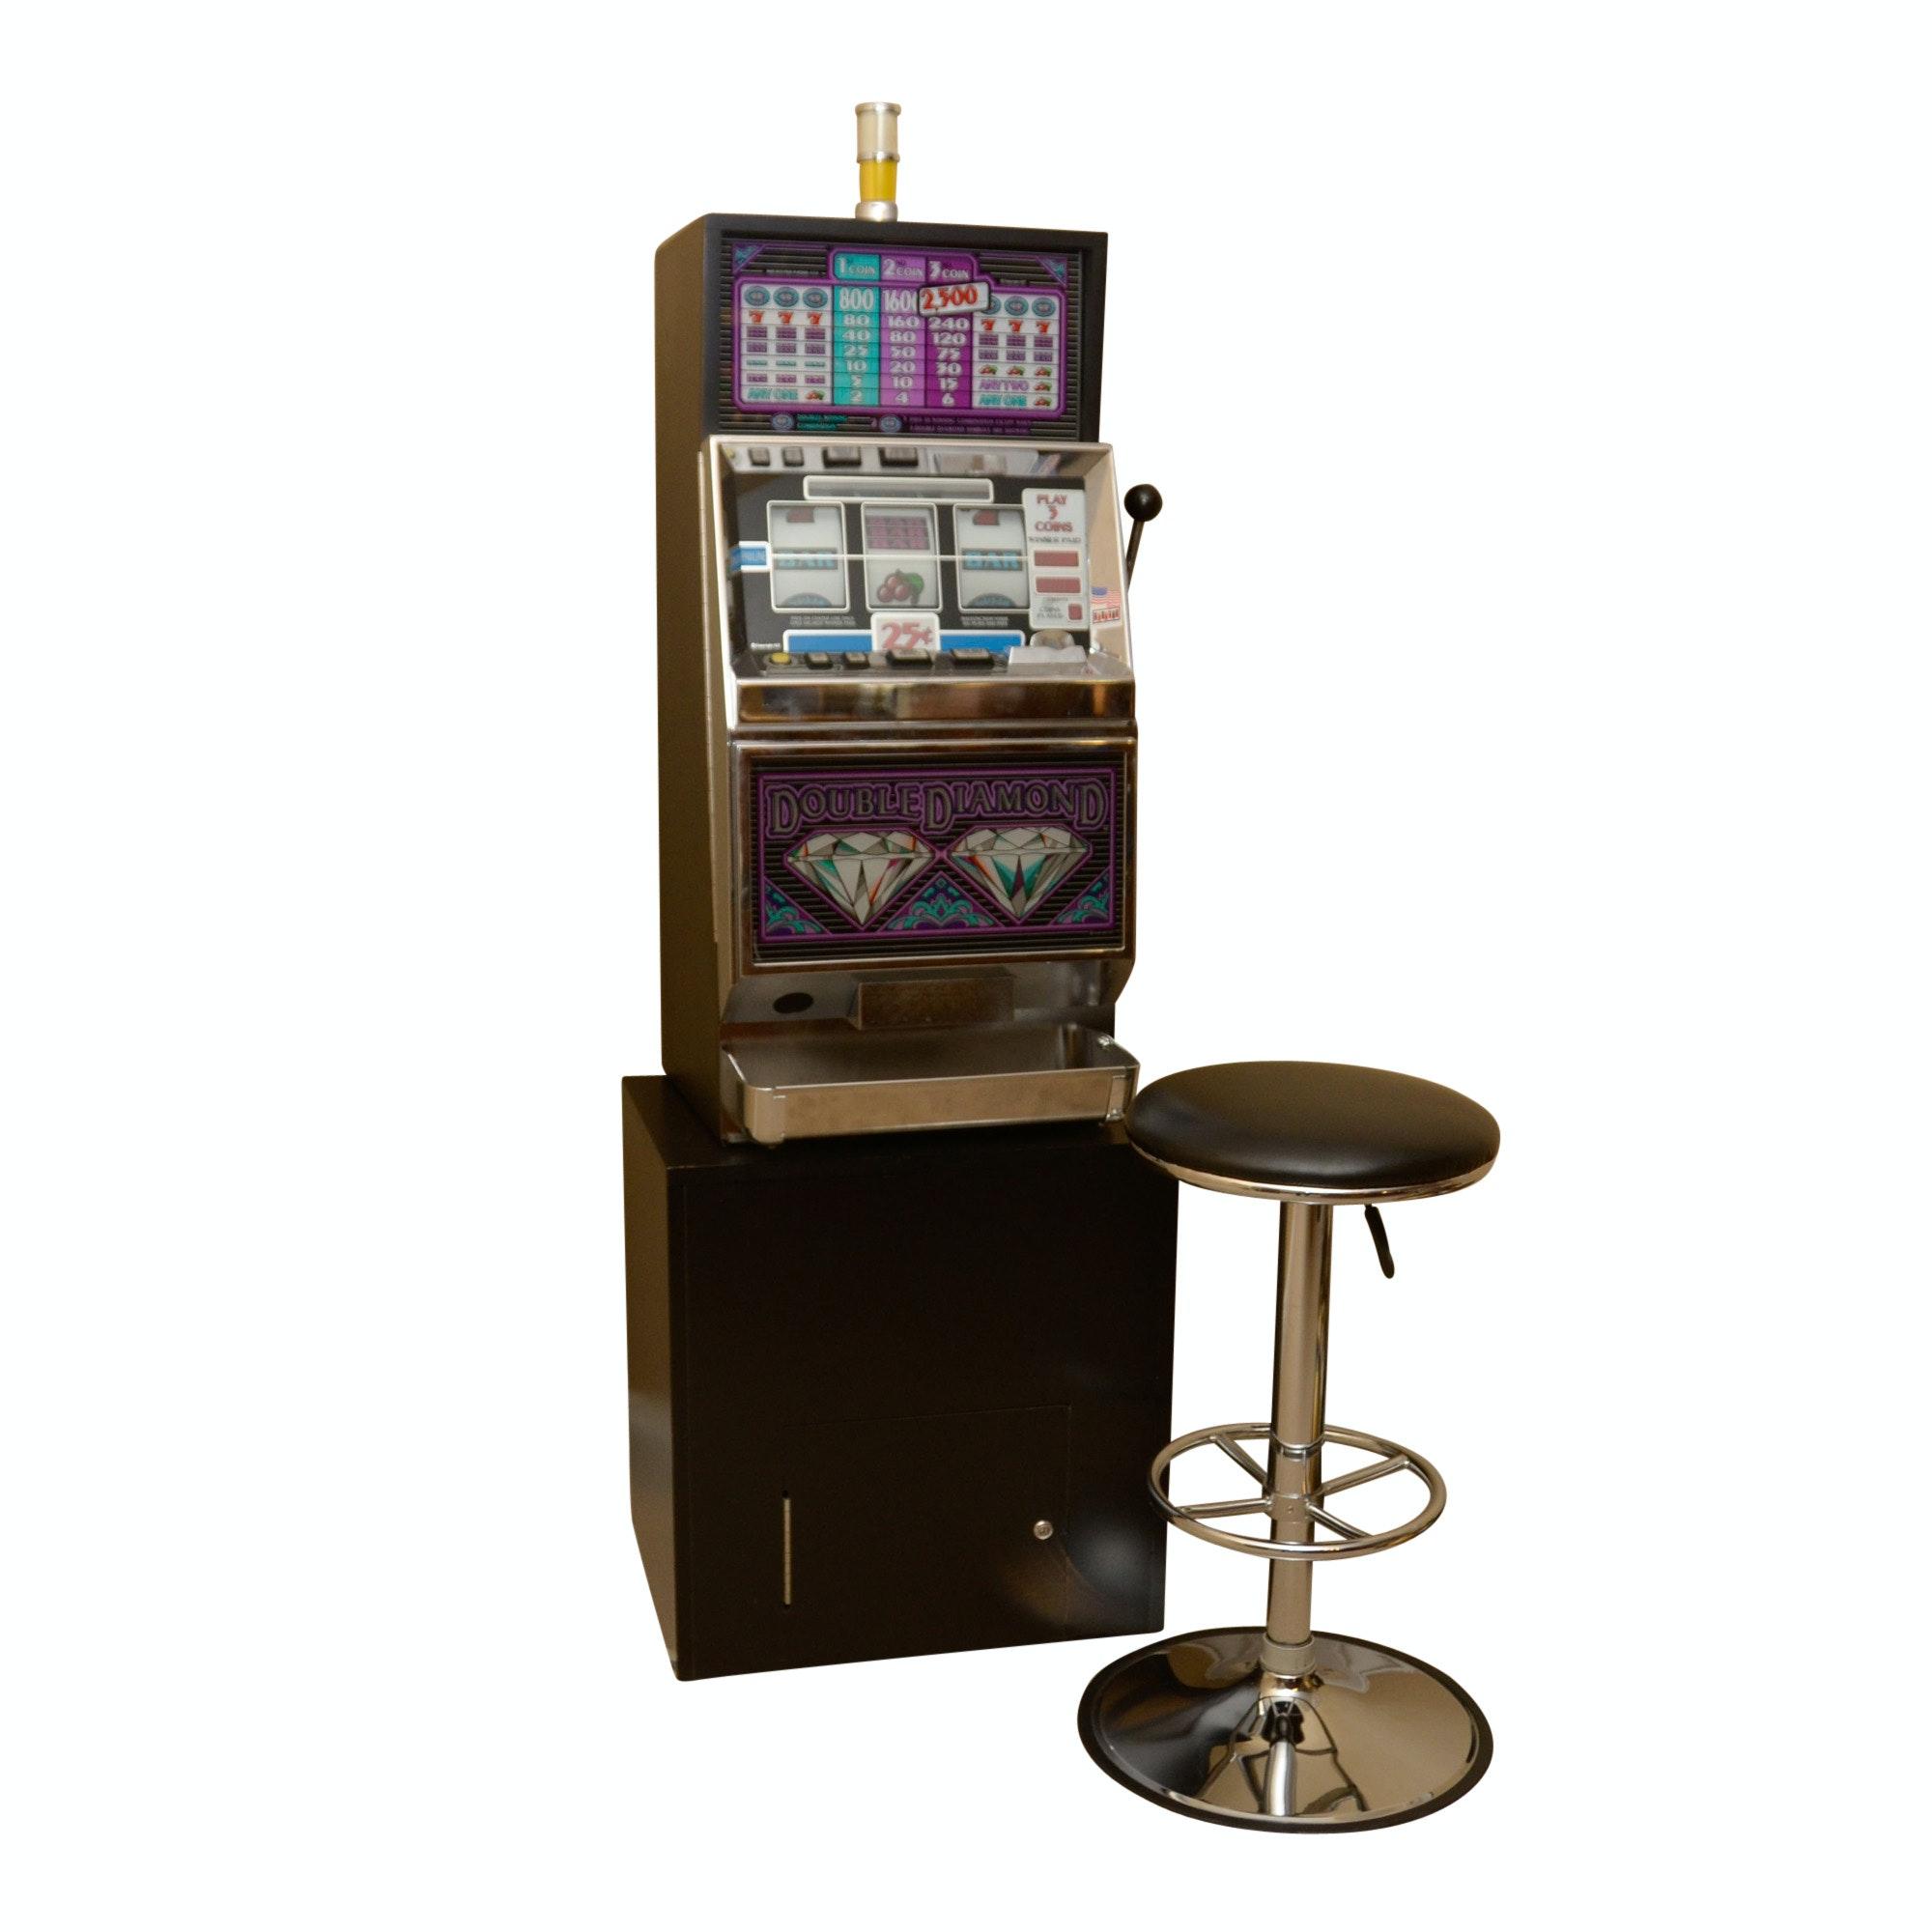 IGT Double Diamond Slot Machine and Stool